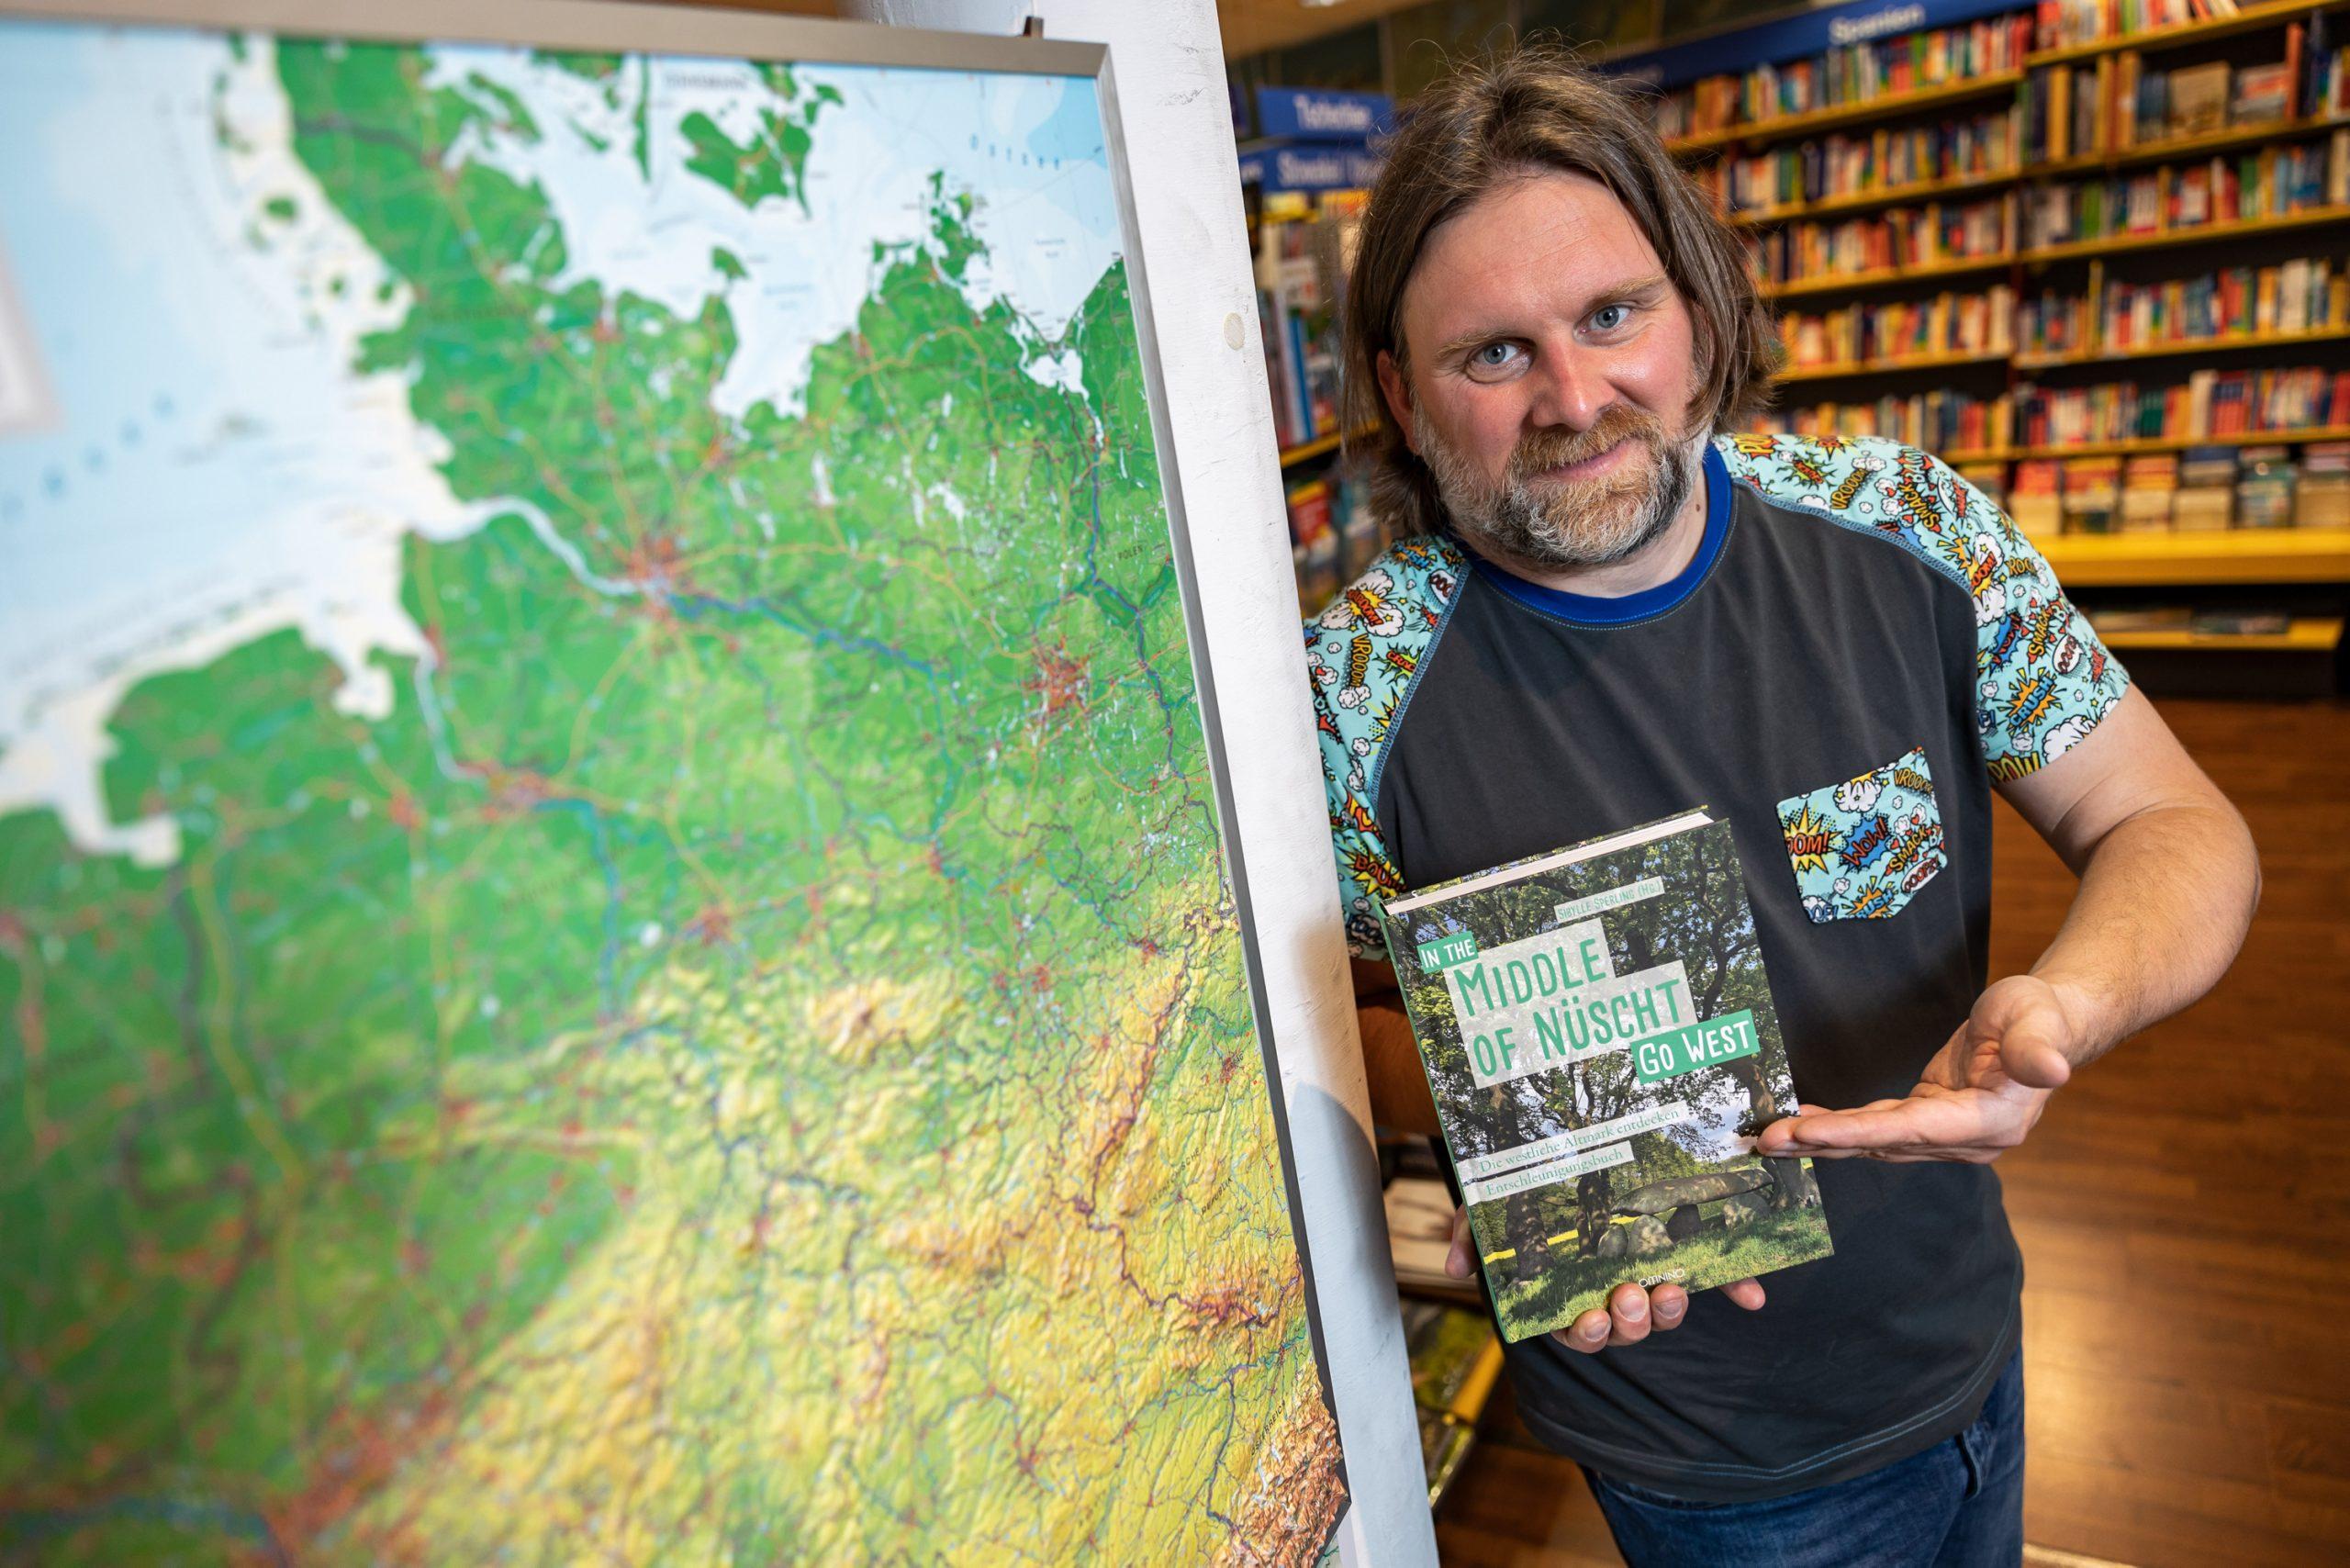 Reisebuchhändler Knud Harms